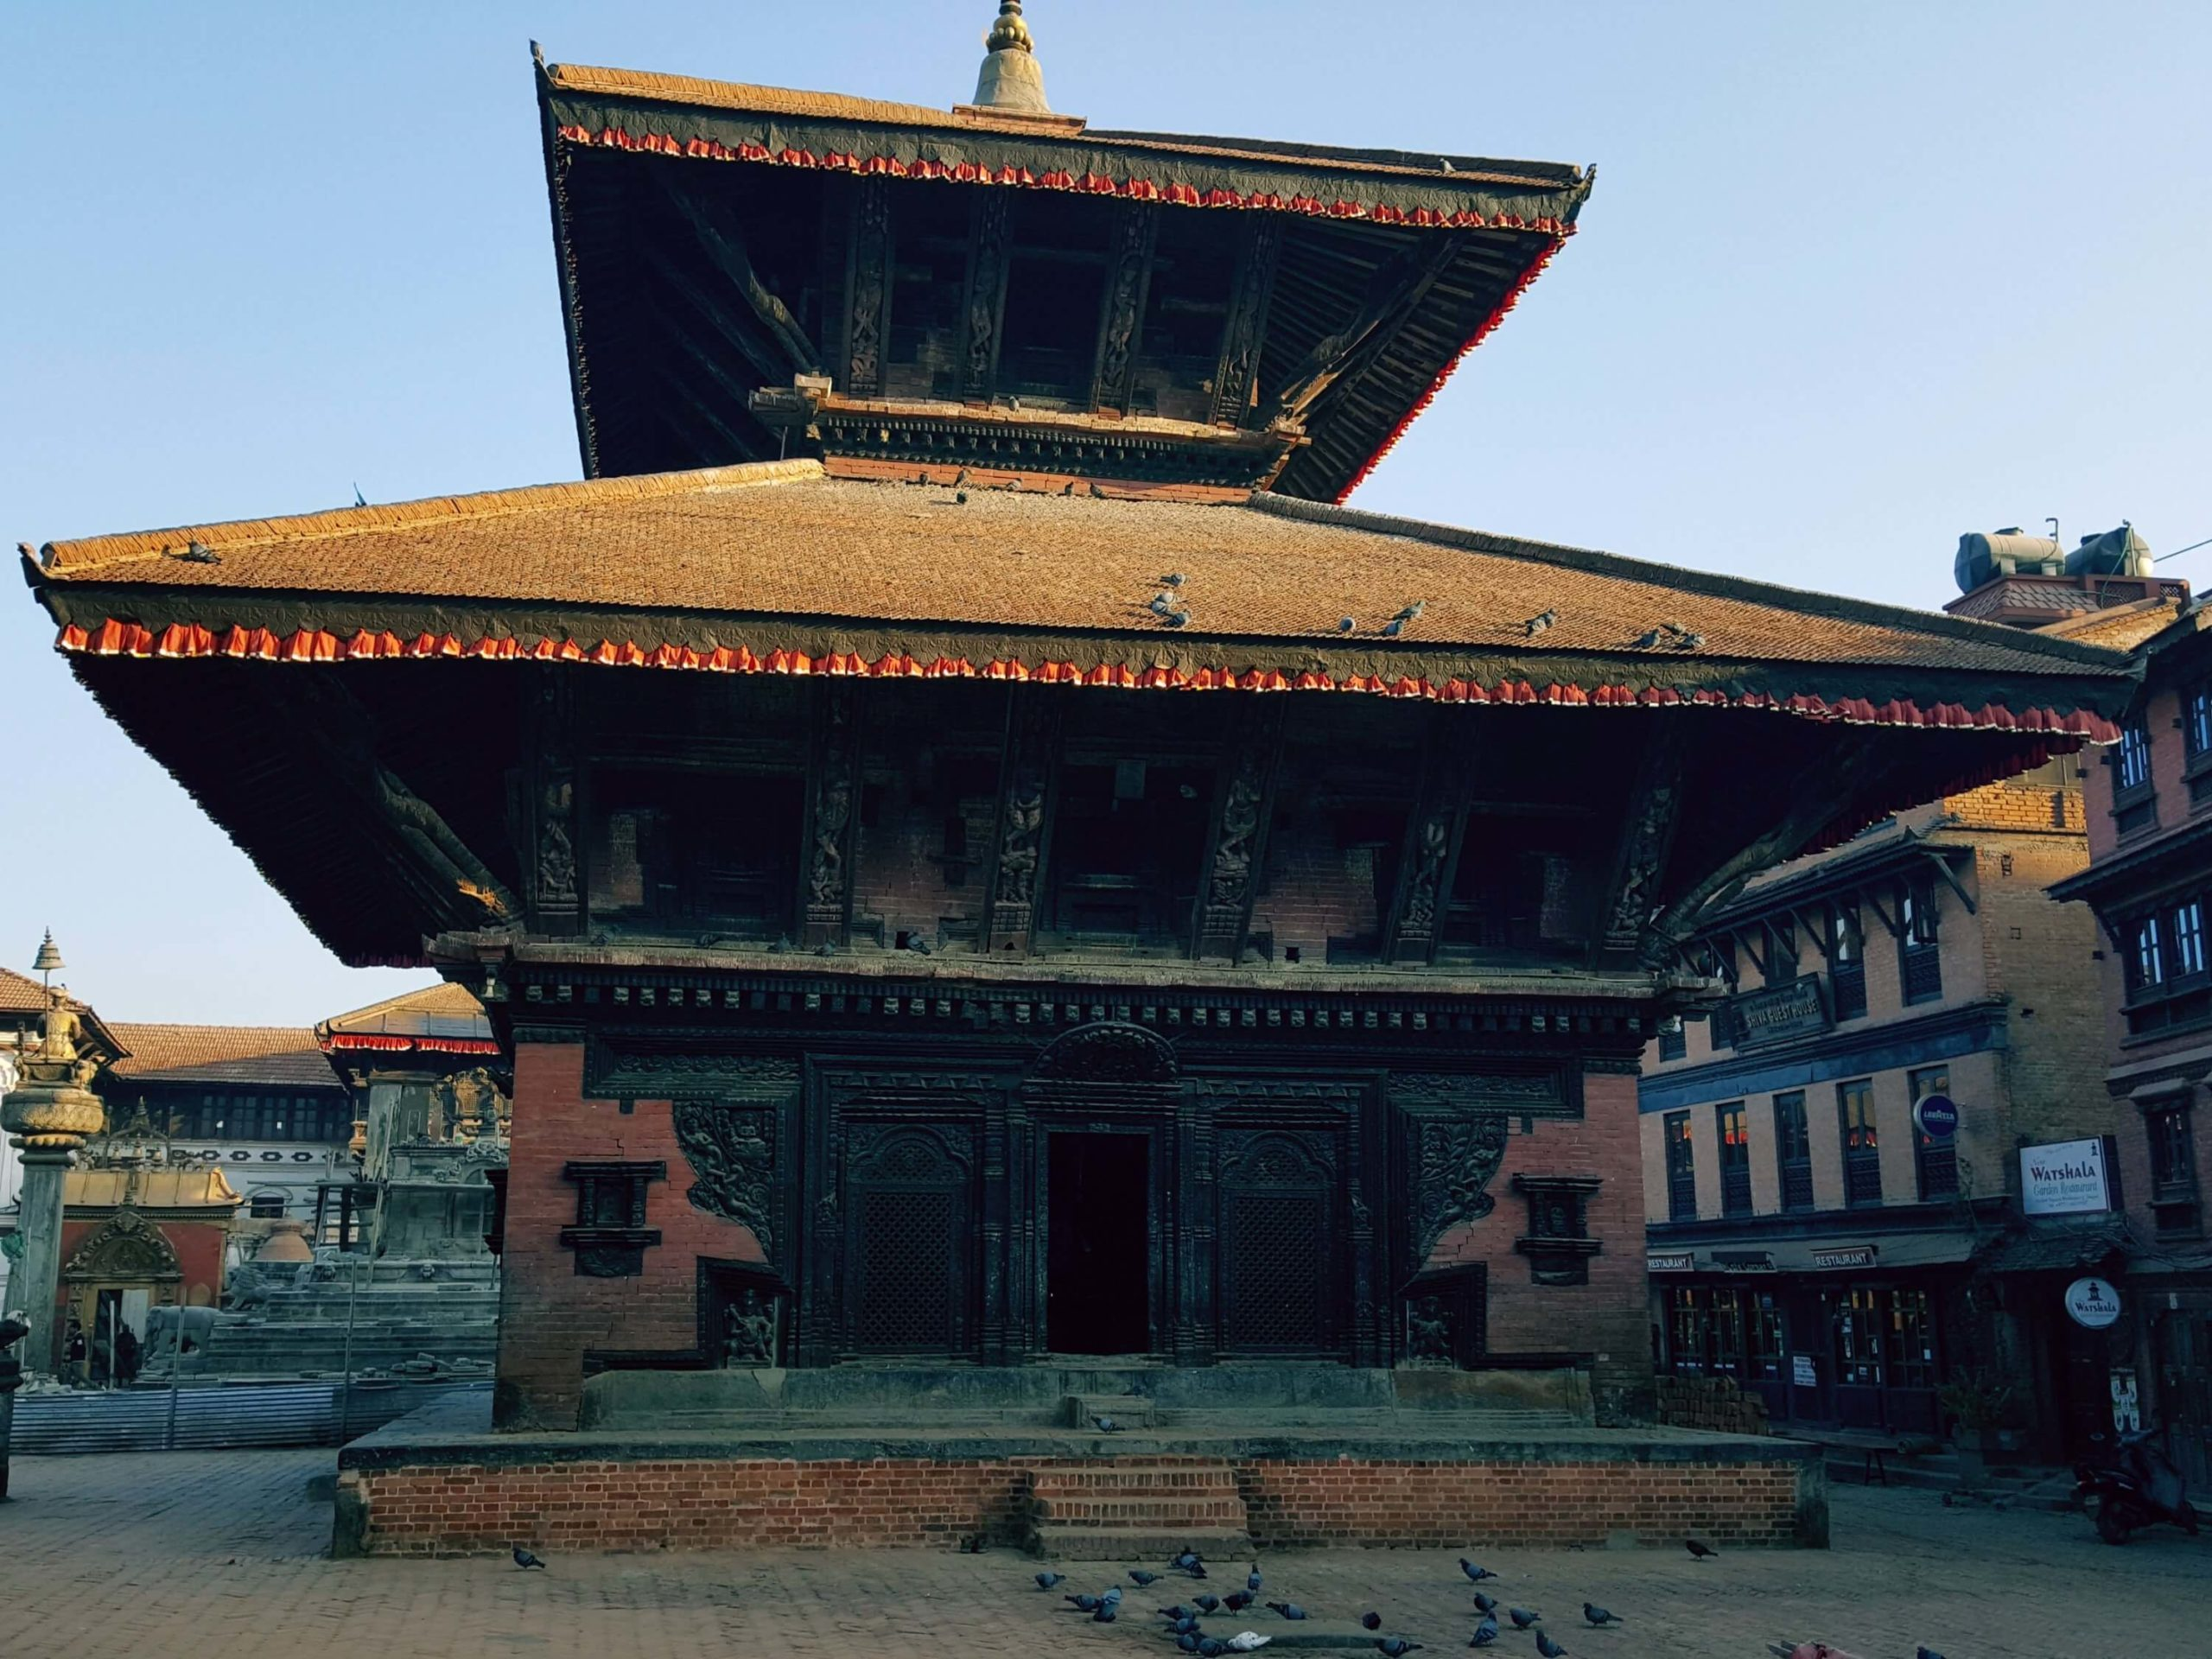 https://www.bhaktapur.com/wp-content/uploads/2020/03/Pashupatinath-scaled.jpg